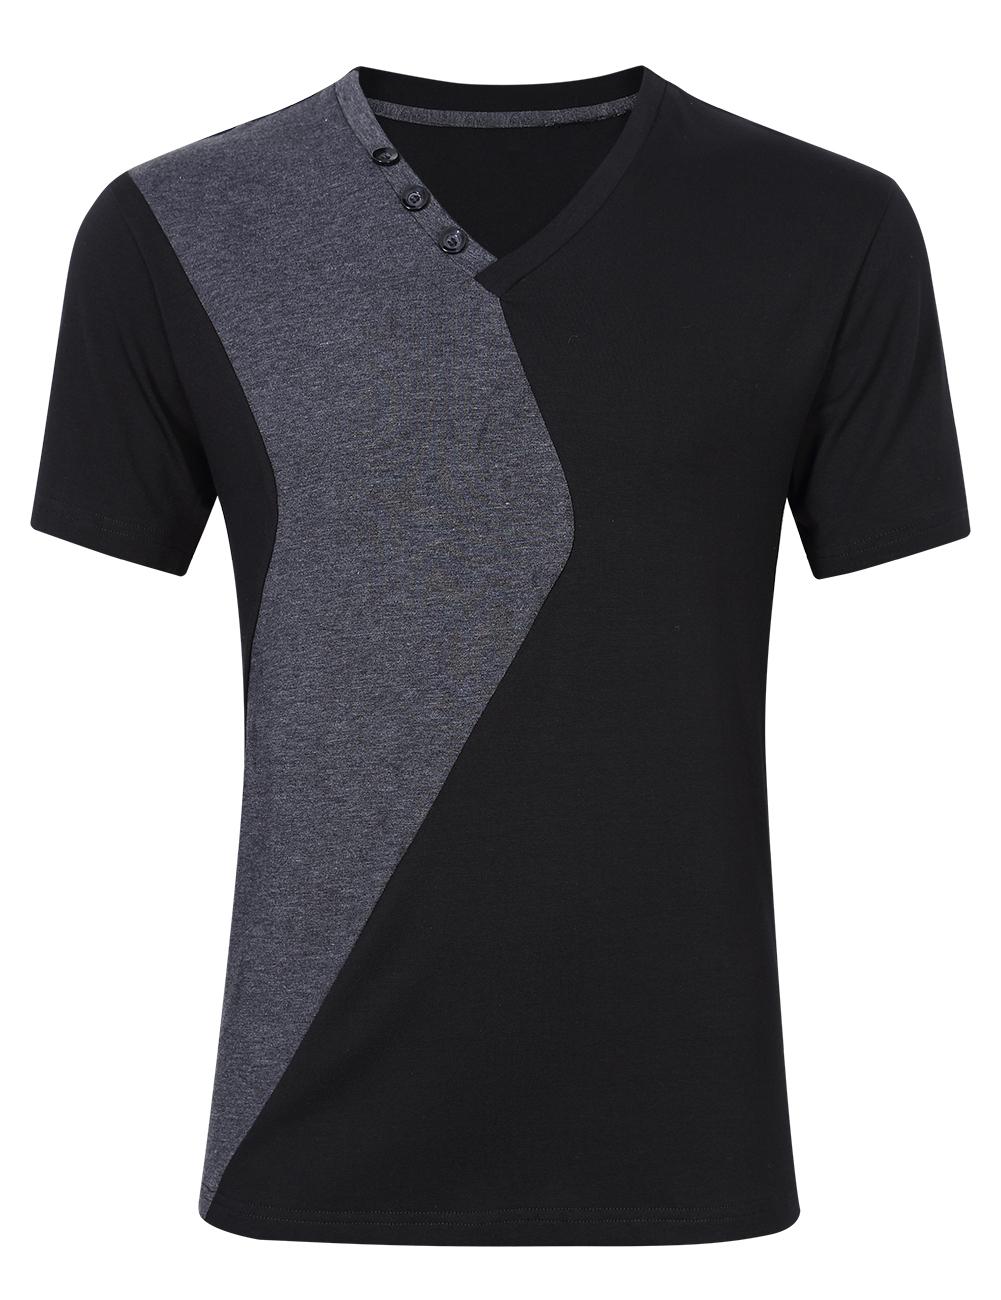 [US Direct] Young Horse Men Fashion Cotton Color Block Short Sleeve Slim T-shirt Black XL Black_5XL